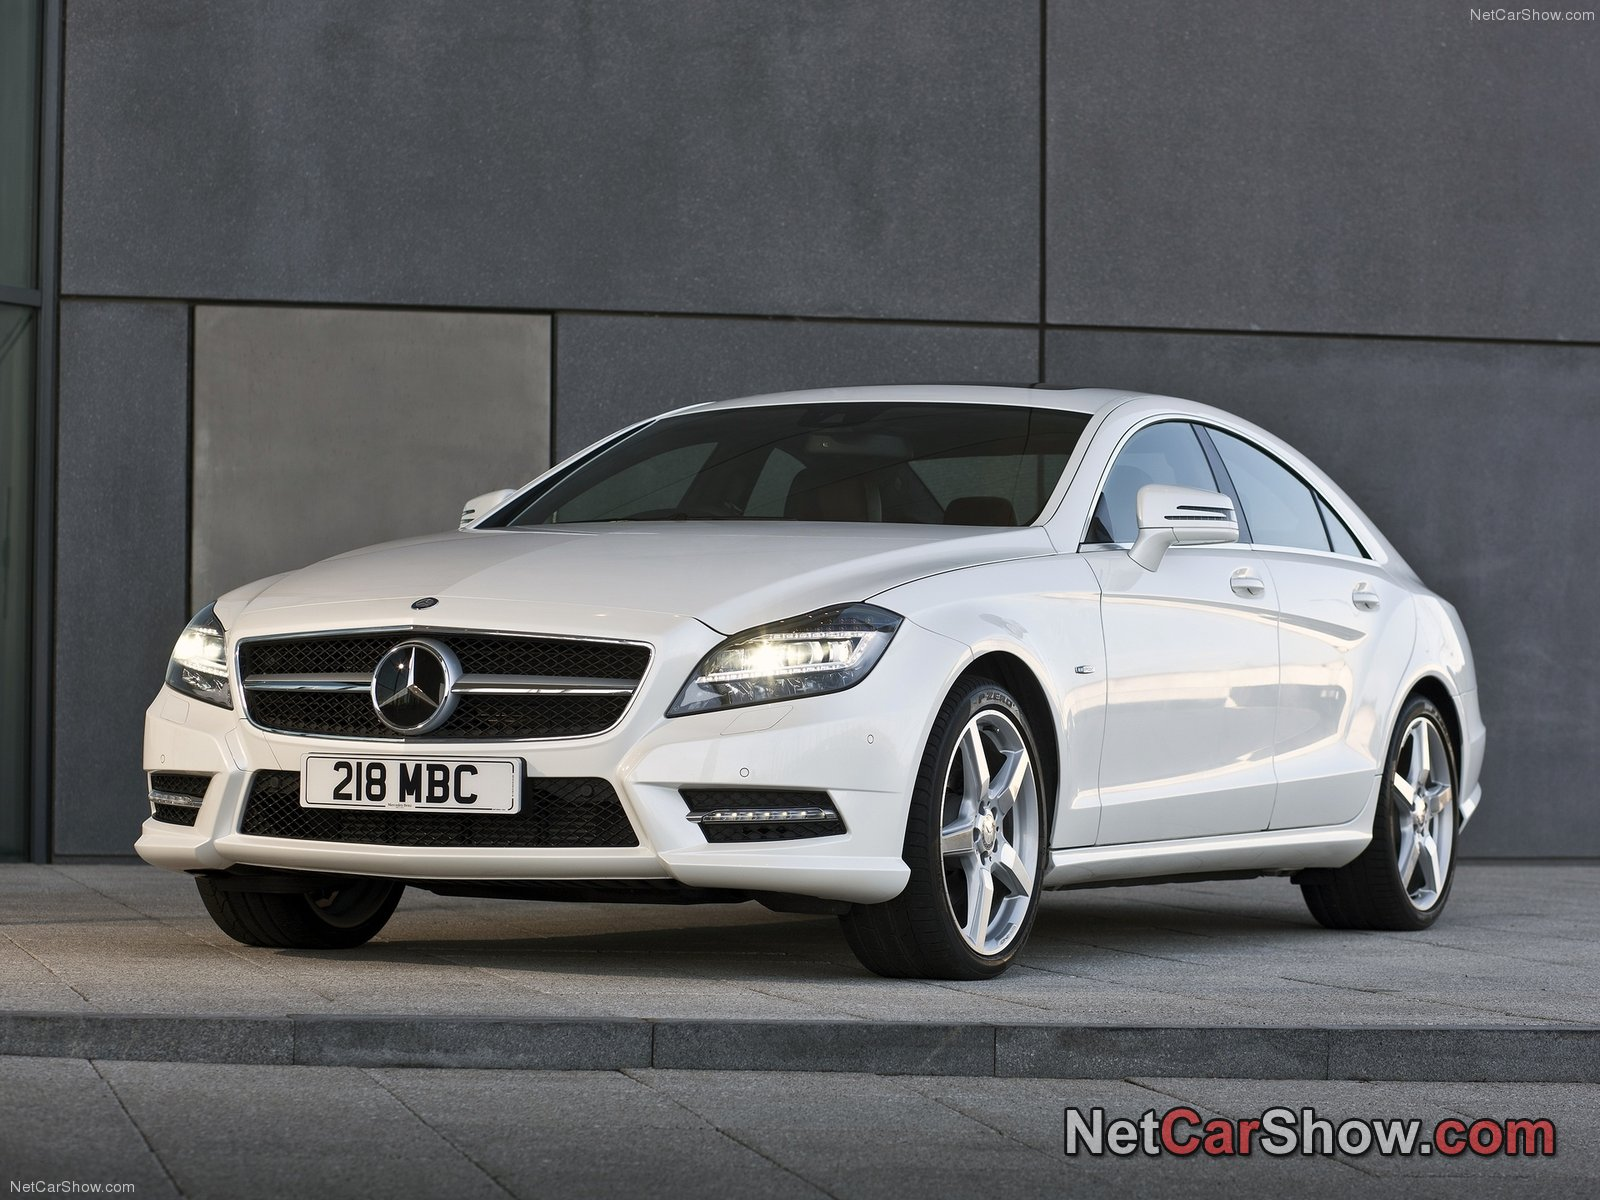 Mercedes benz cls picture 85668 mercedes benz photo for Mercedes benz video